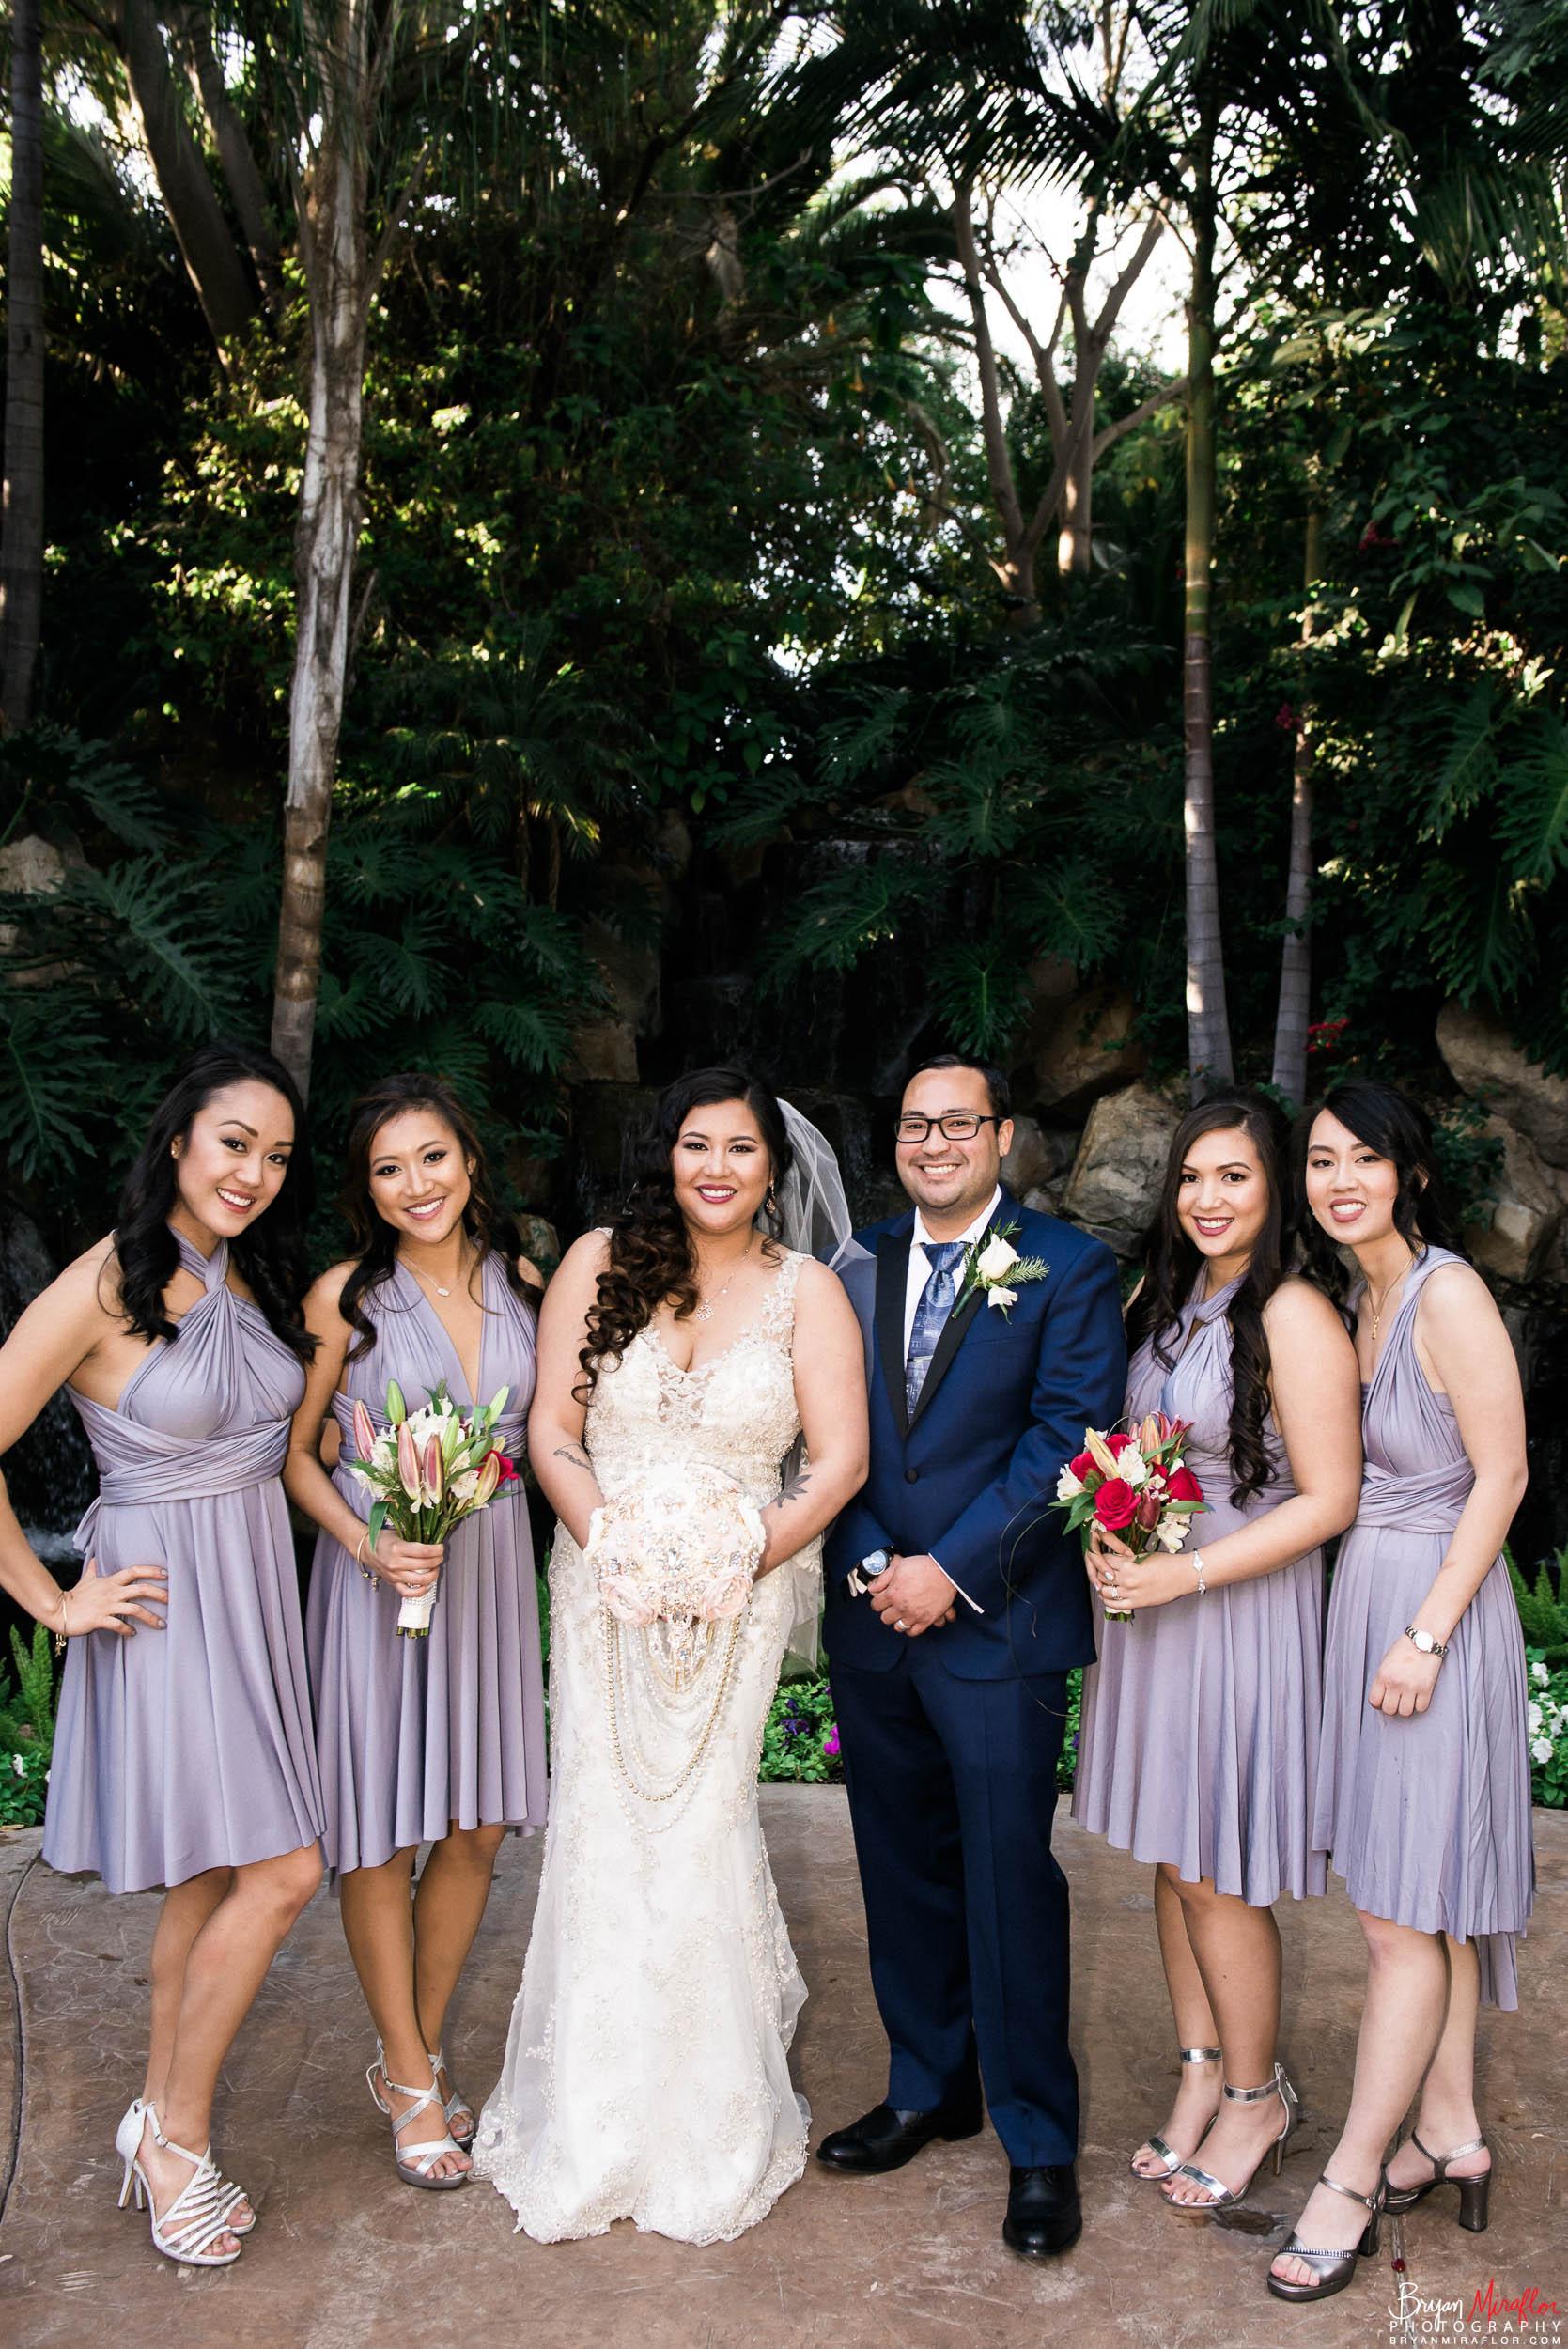 Bryan-Miraflor-Photography-Hannah-Jonathan-Married-Grand-Traditions-Estate-Gardens-Fallbrook-20171222-136.jpg